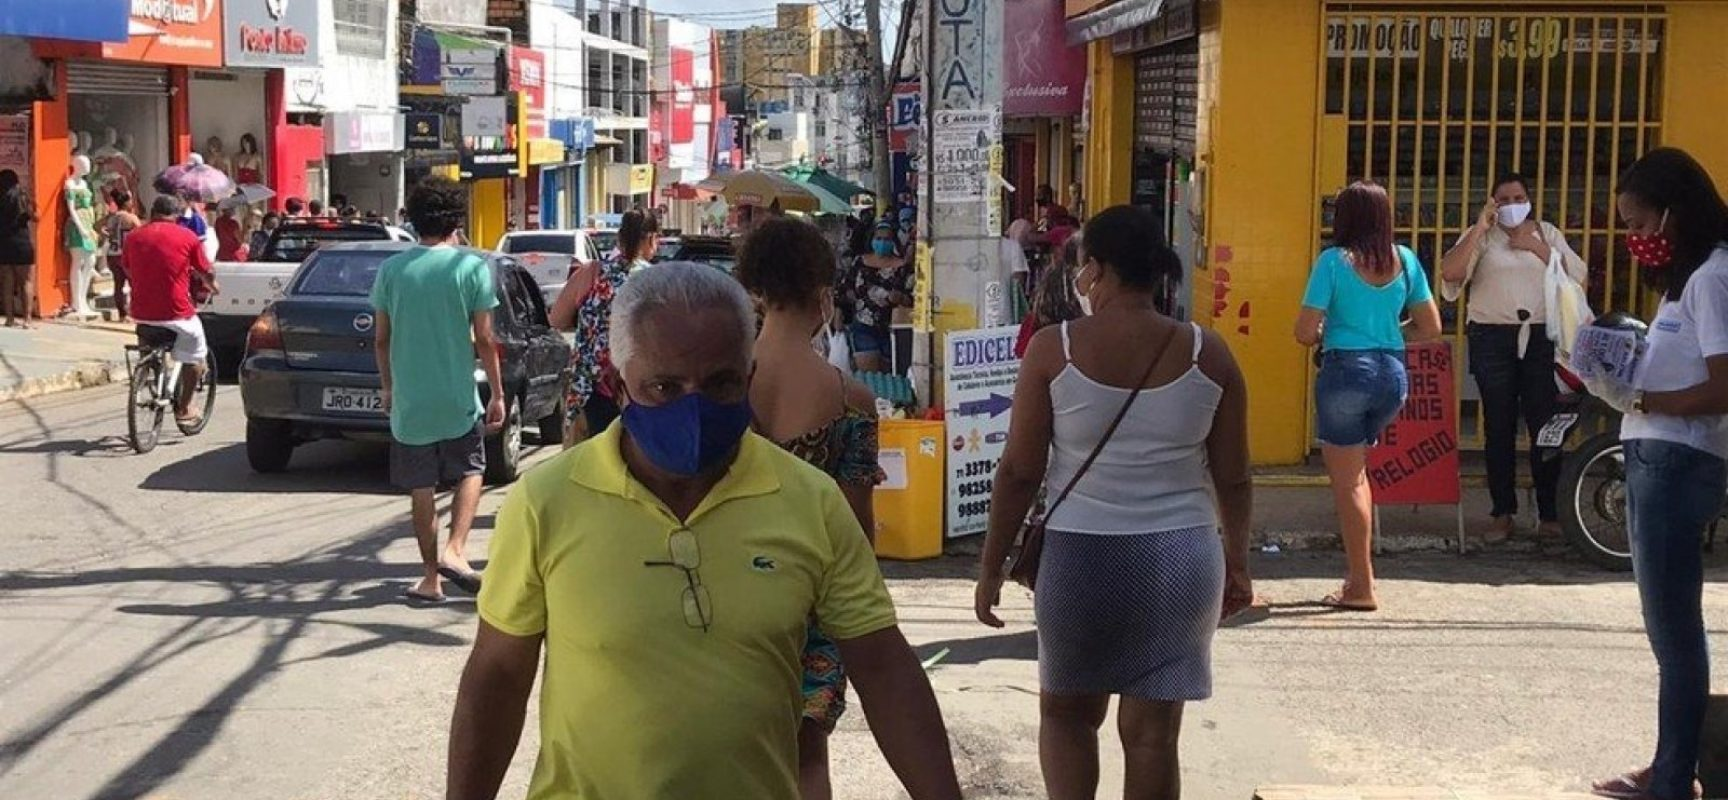 Prefeitura de Lauro de Freitas anuncia reabertura do comércio nesta segunda